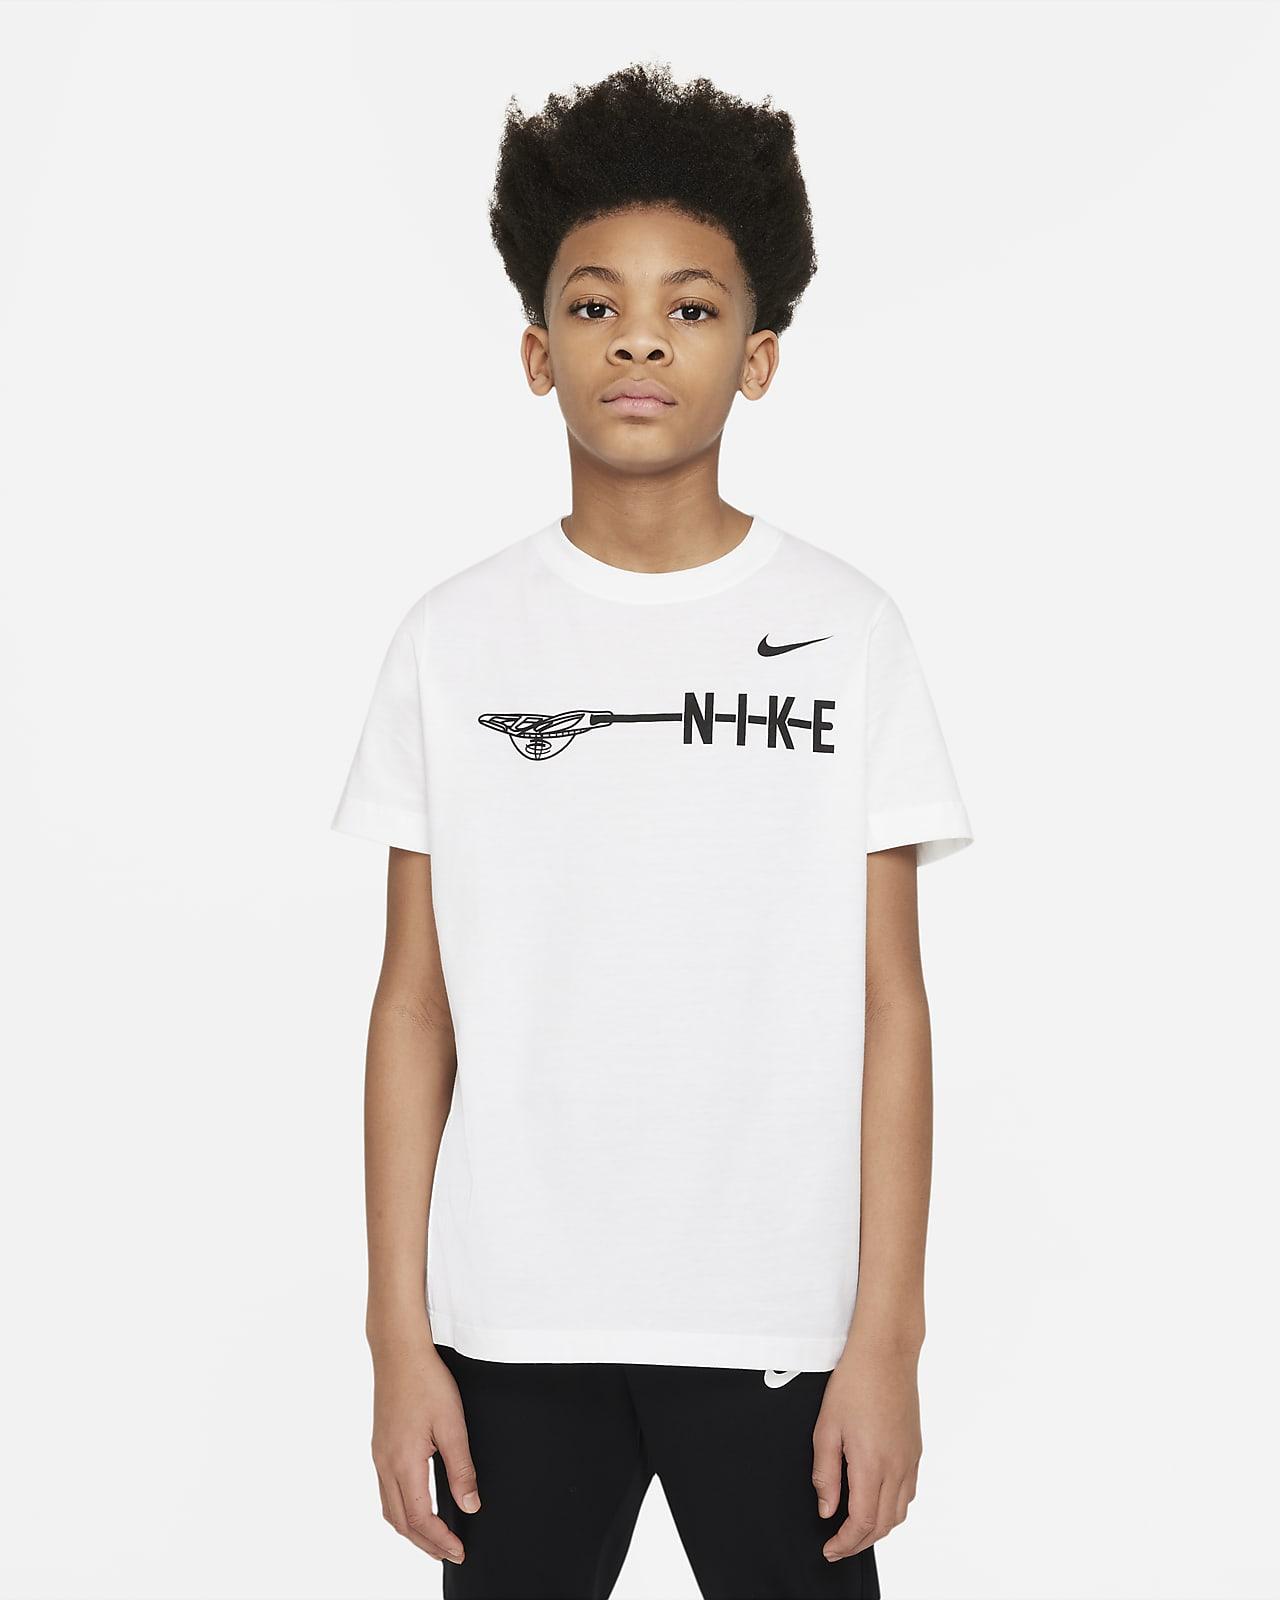 Nike Big Kids' (Boys') Lacrosse T-Shirt